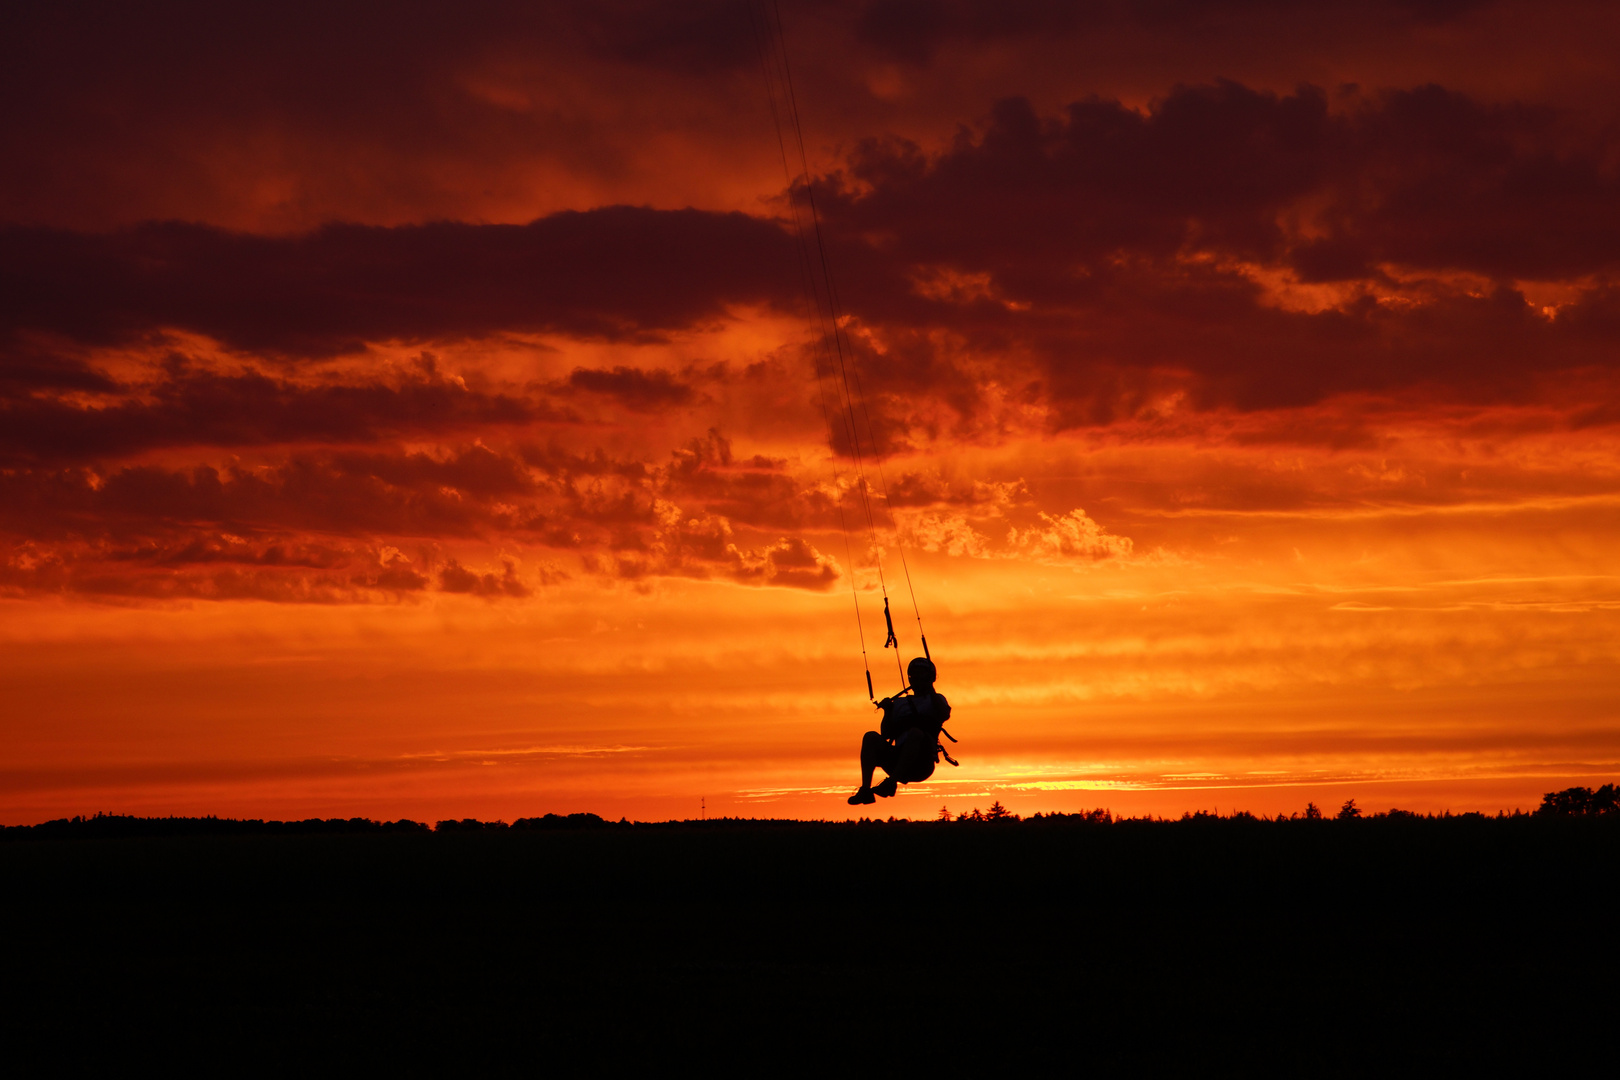 Kiten im Sonnenuntergang